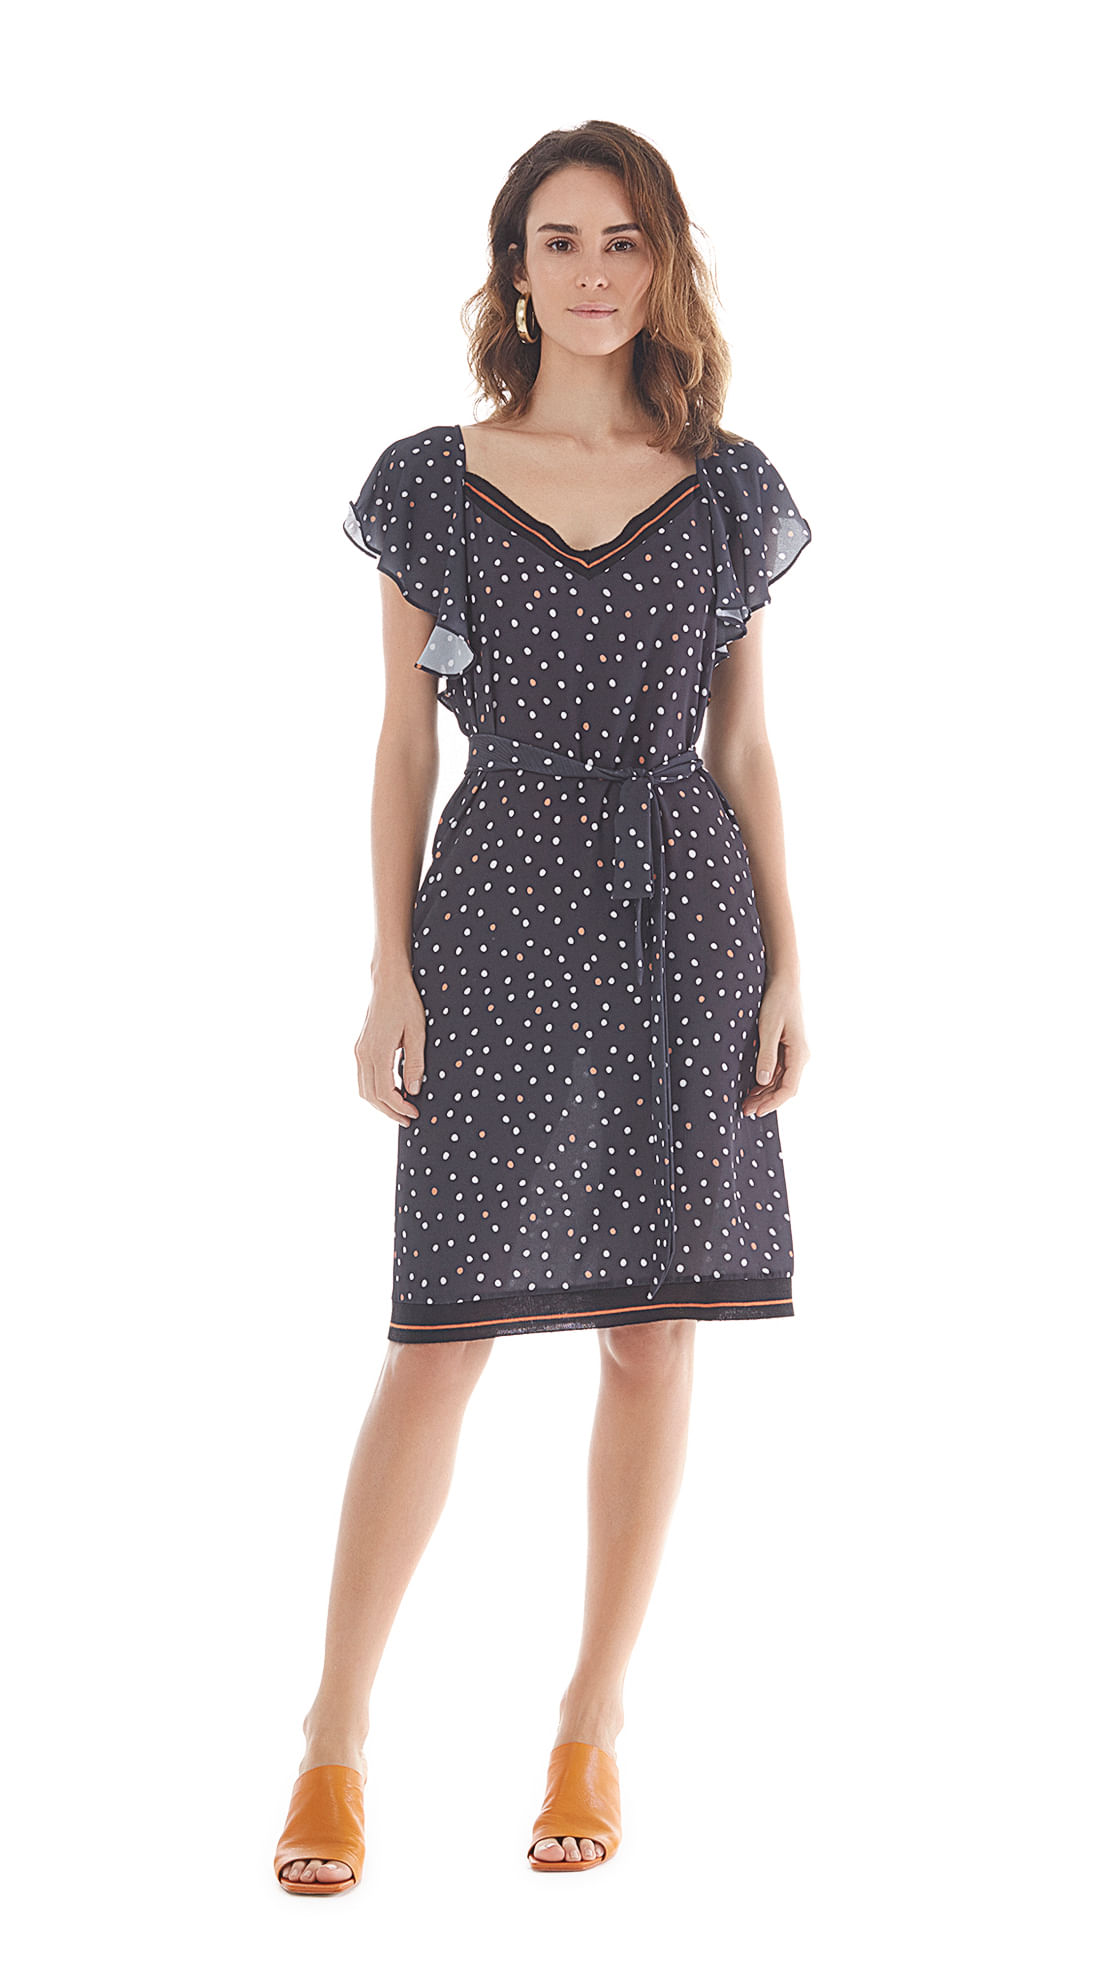 81101ba28e Vestido Curto Decote V Essential Preto - Maria Valentina